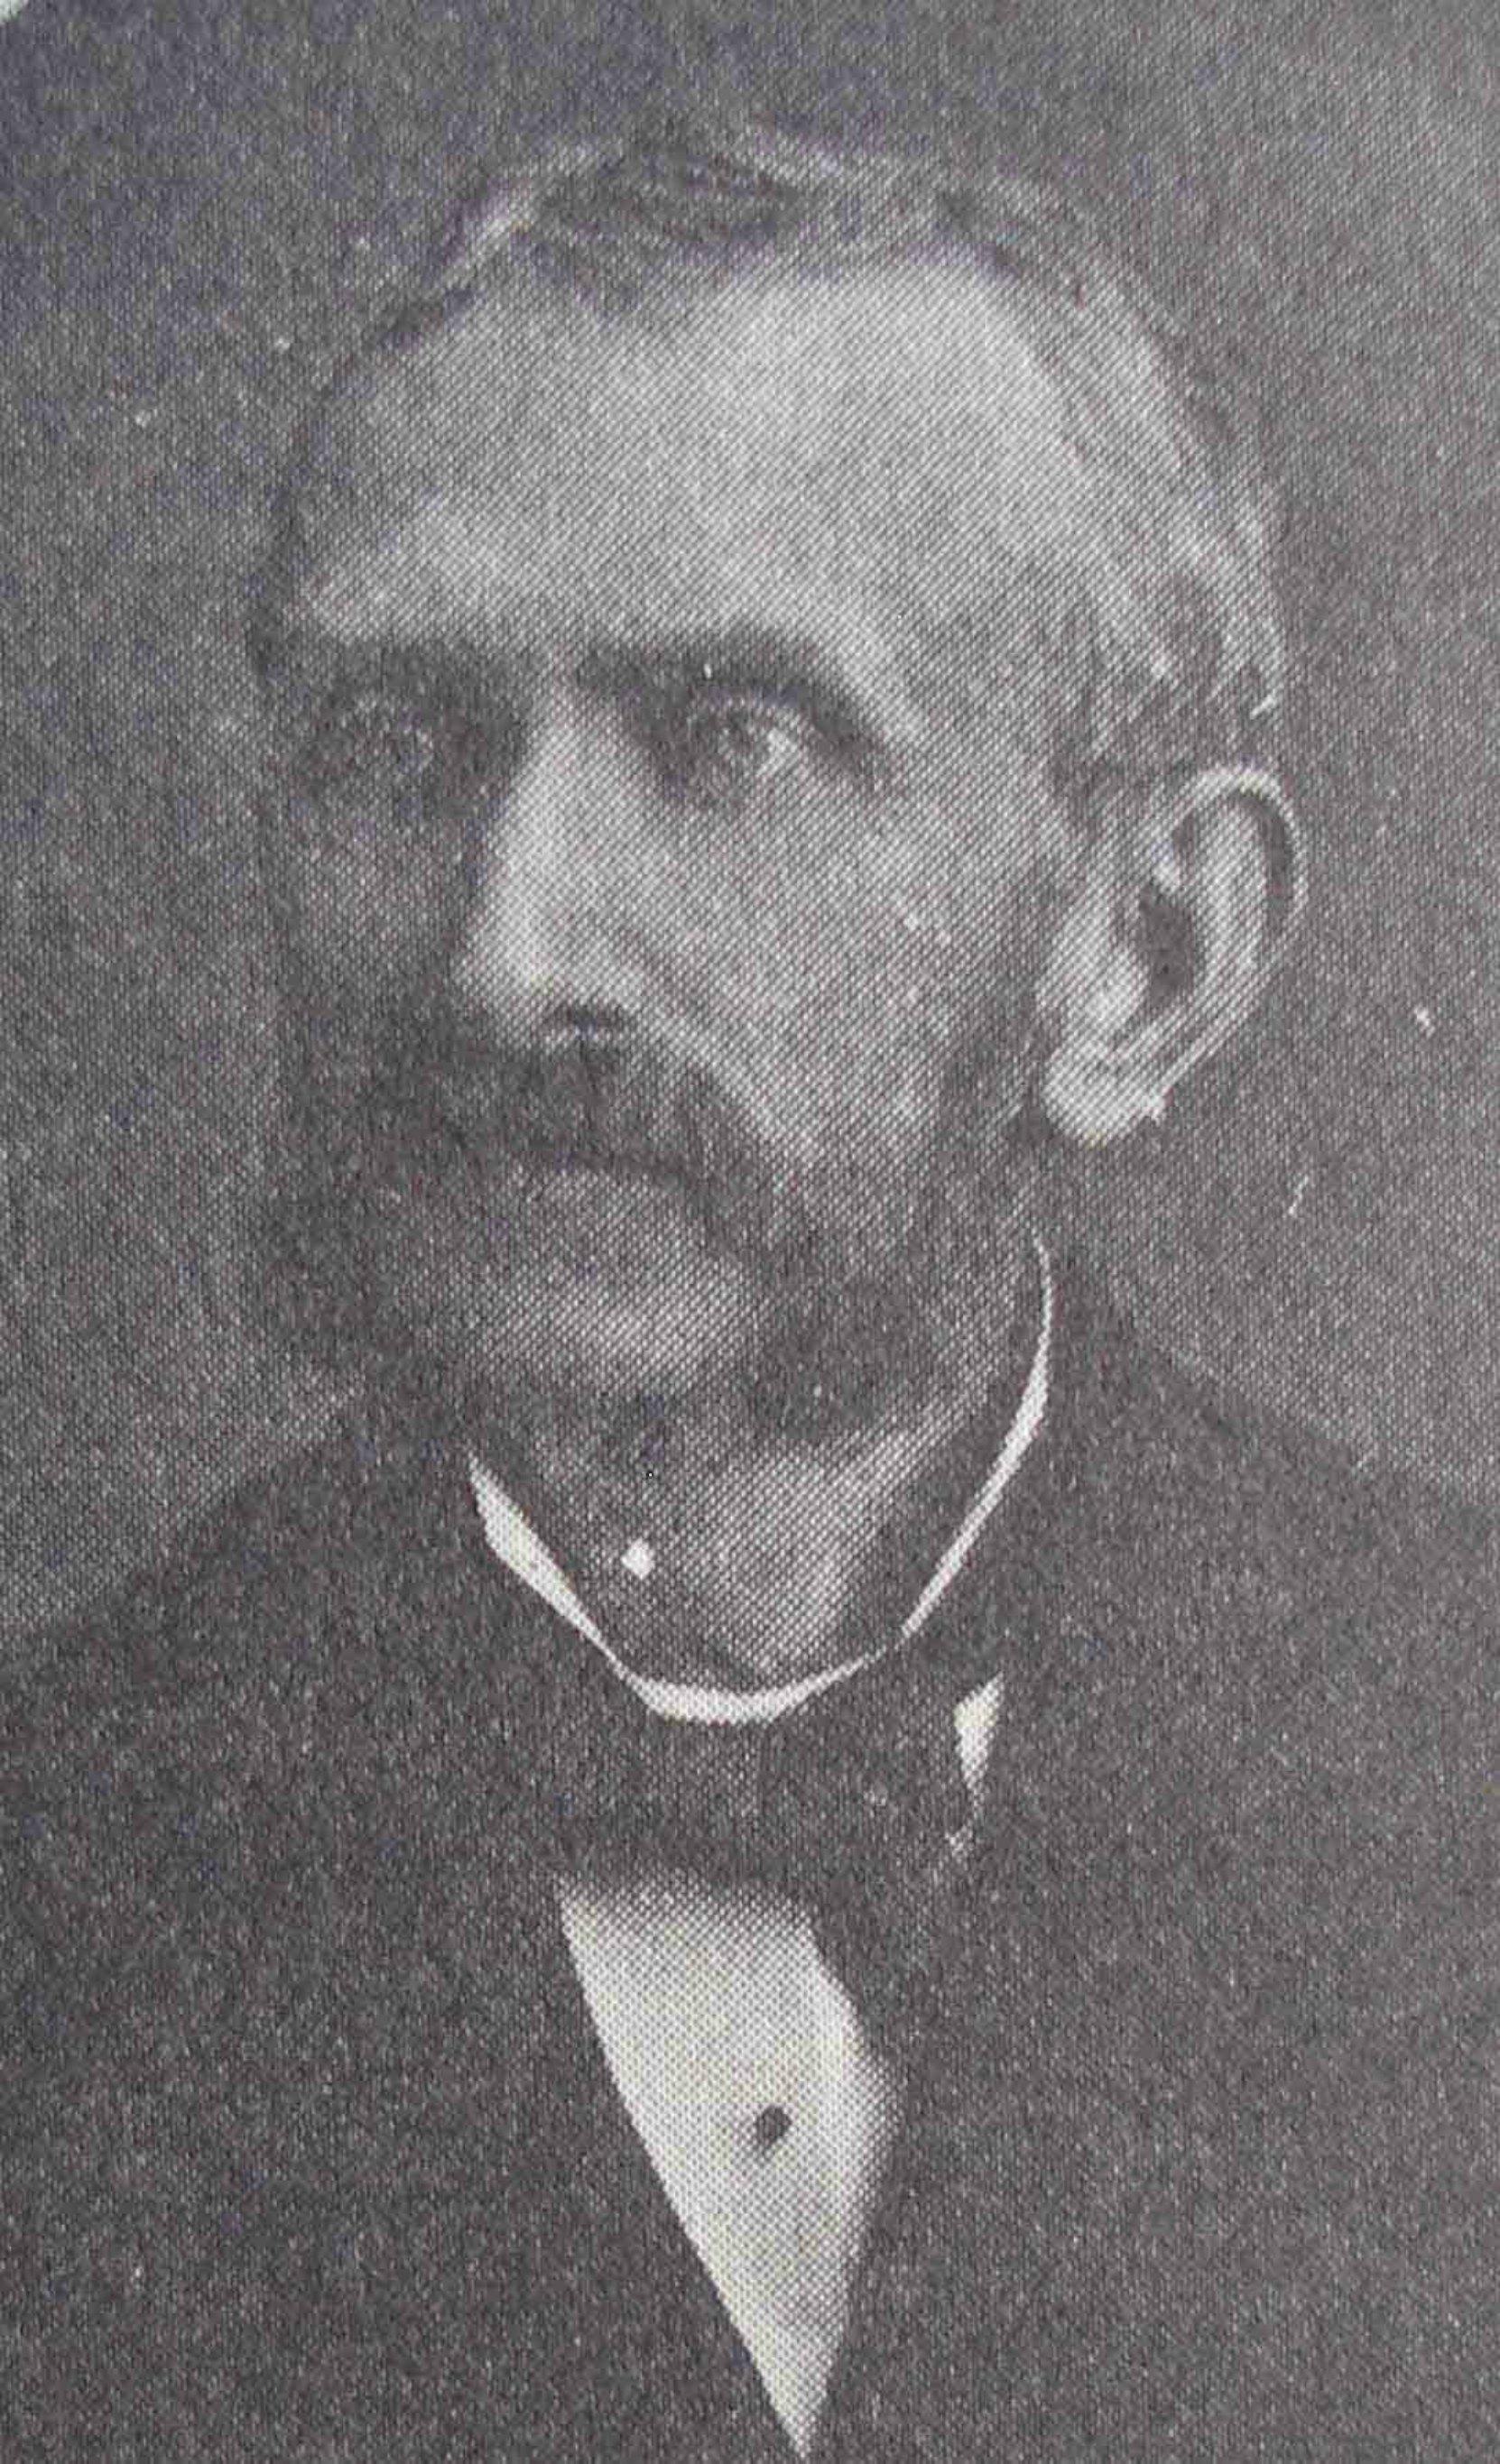 Henry Frederick Heisterman